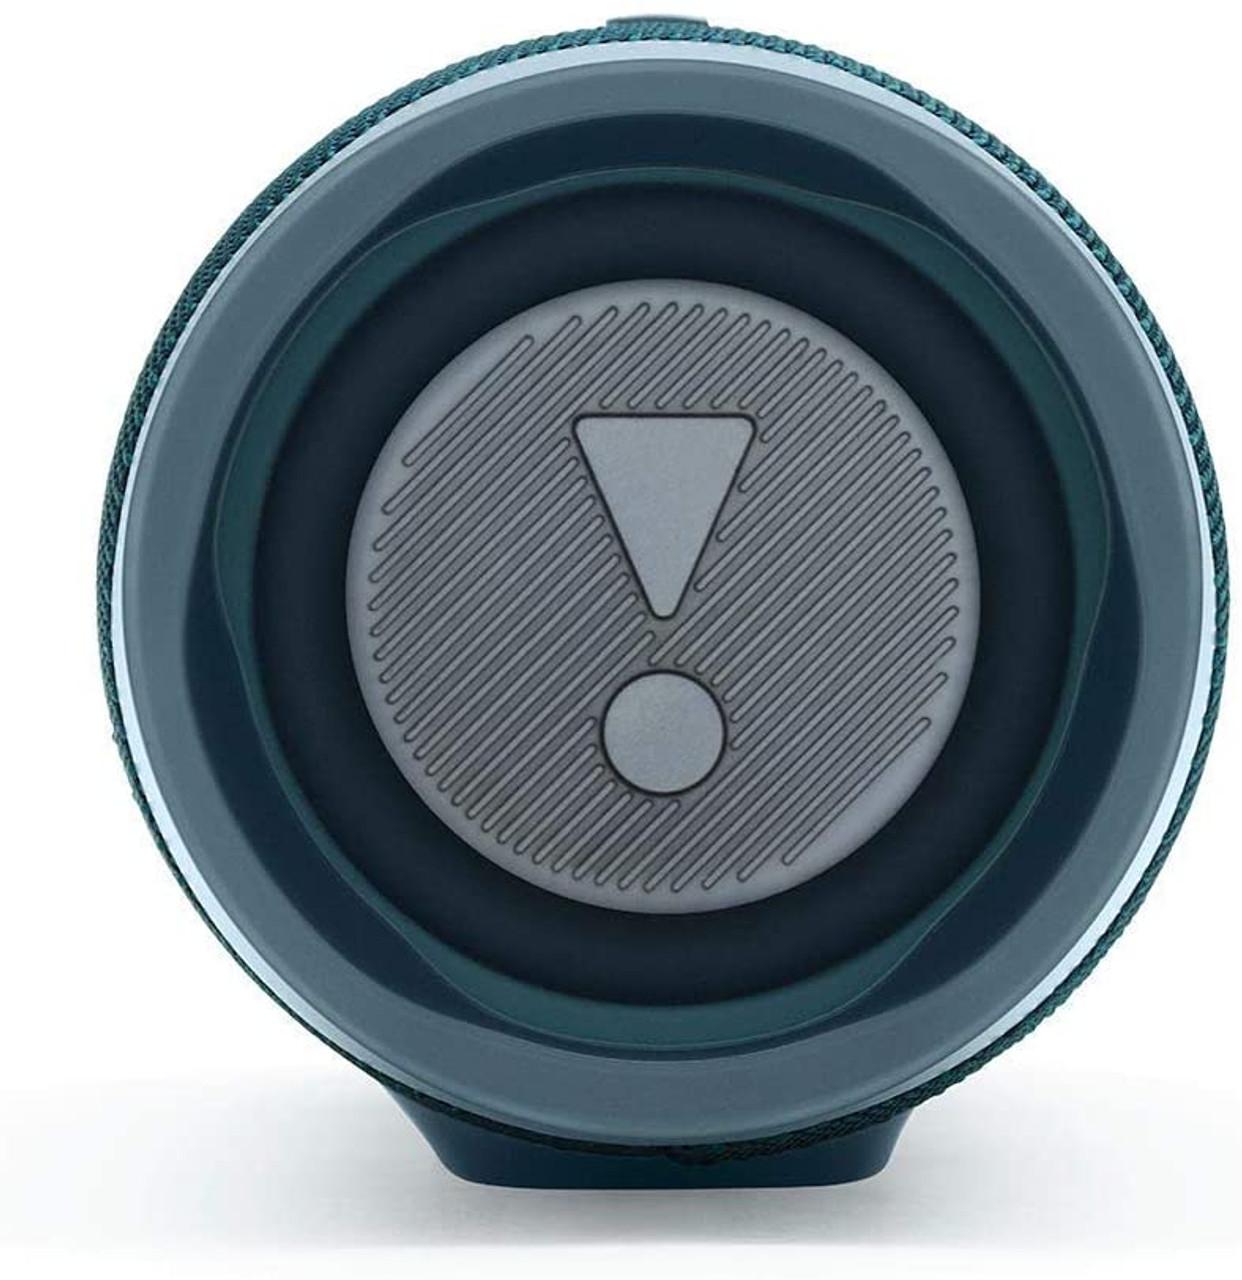 Jbl Kit Jblcharge4bluam Z Khanka Charge 4 Waterproof Wireless Bluetooth Speaker Bundle With Portable Hard Case Blue Certified Refurbished Deal Parade